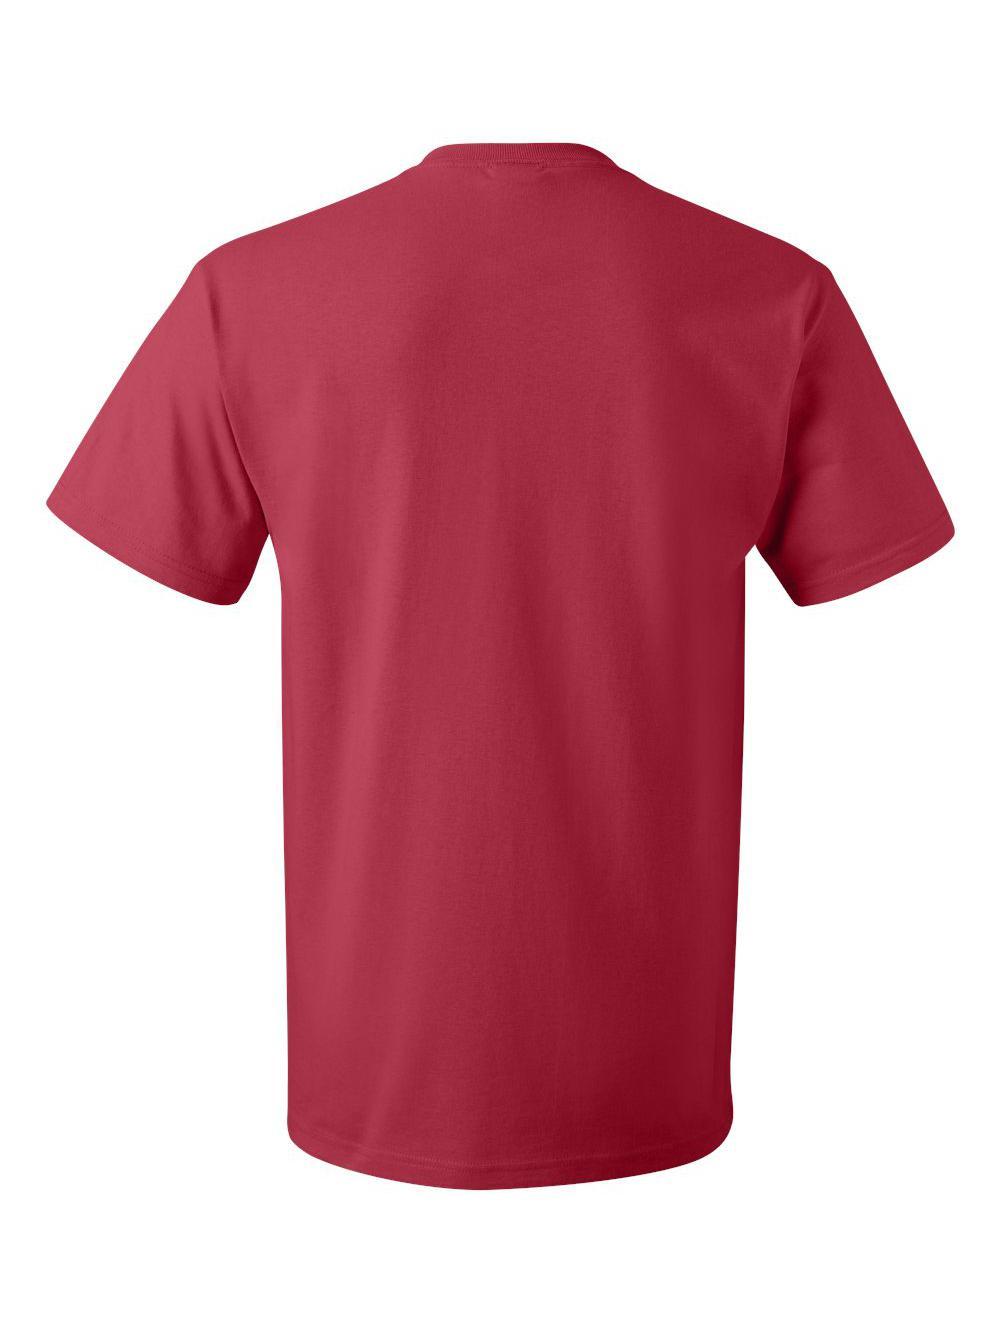 Fruit-of-the-Loom-HD-Cotton-Short-Sleeve-T-Shirt-3930R thumbnail 133